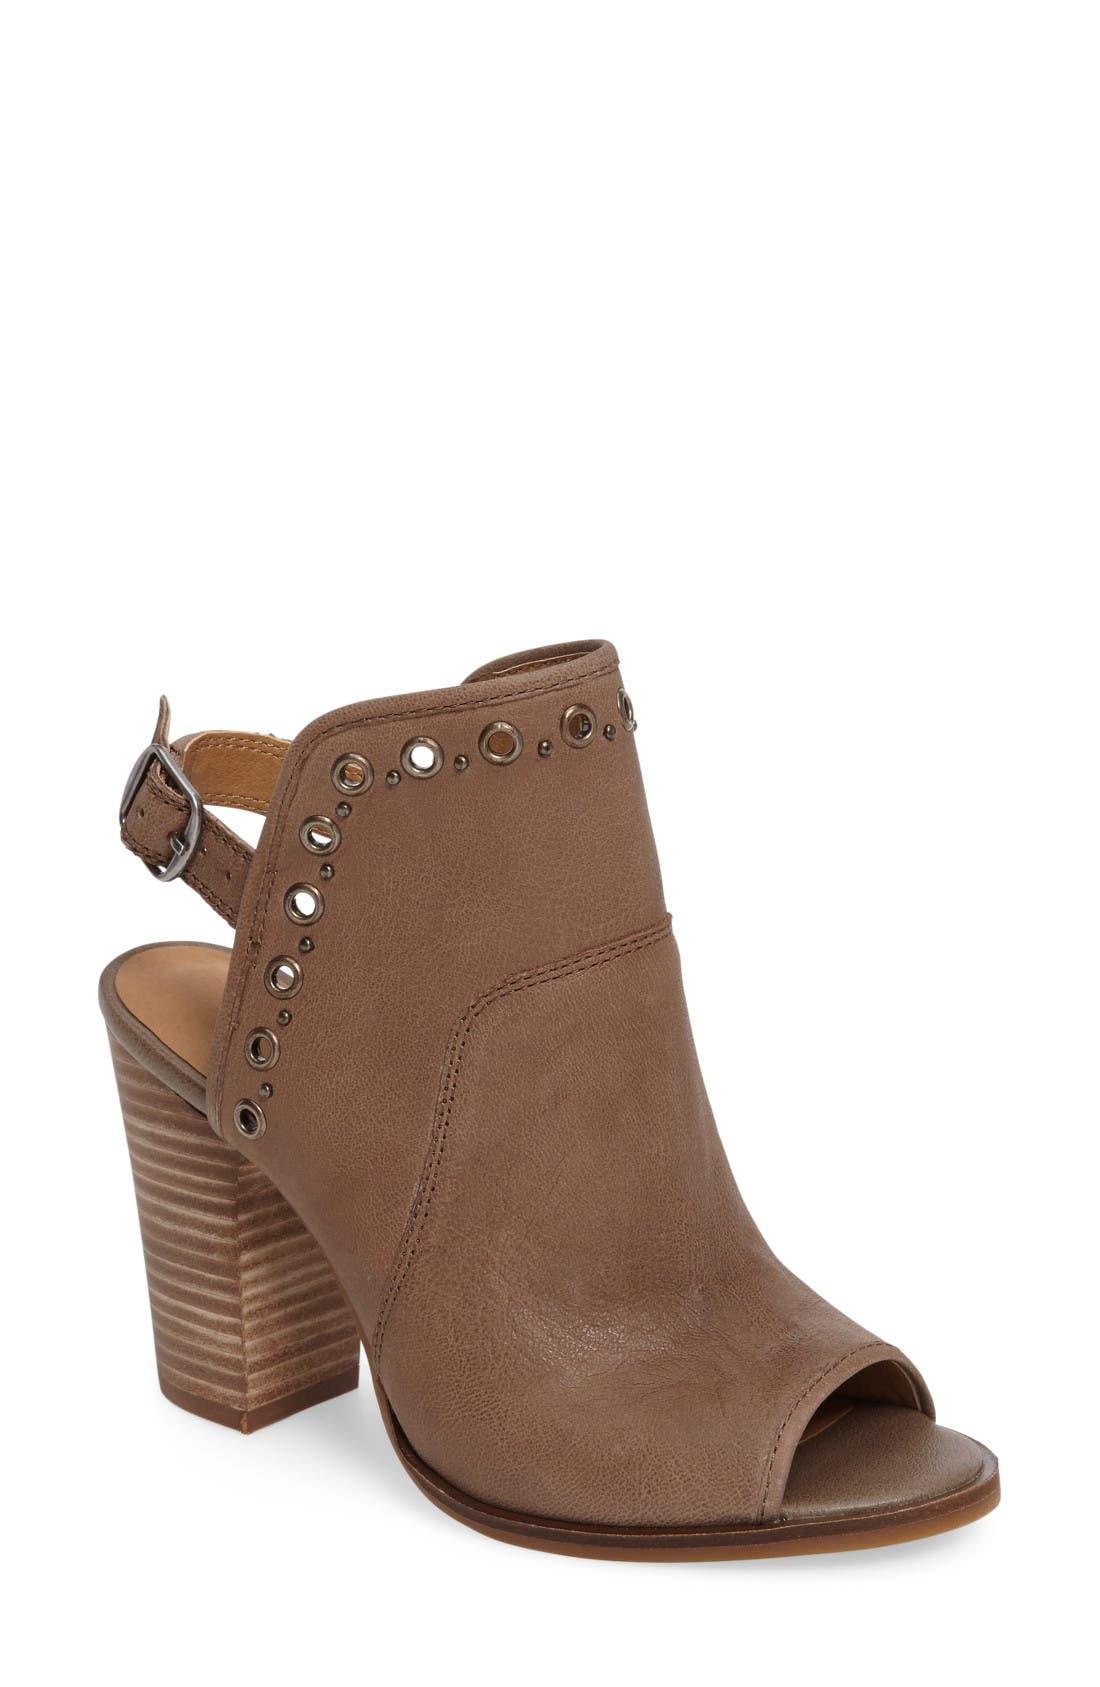 Main Image - Lucky Brand Lorillar Sandal (Women)